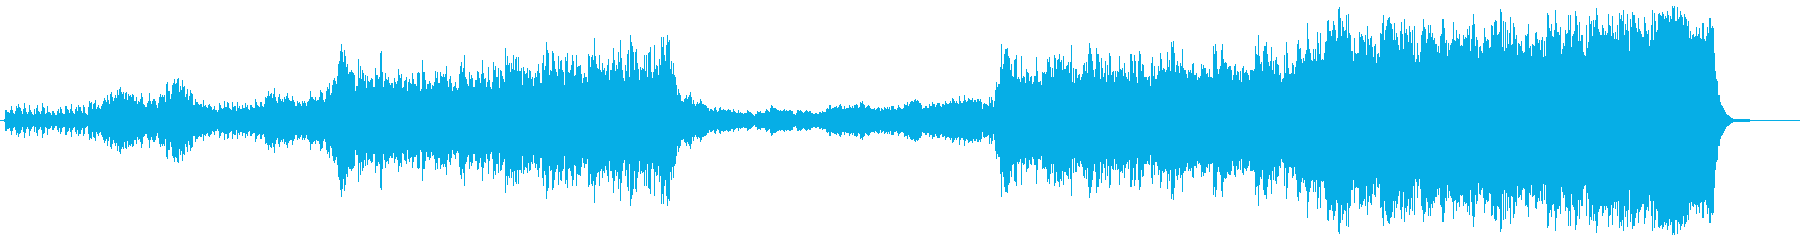 RPG 旅立ち オーケストラ オケ版の再生済みの波形